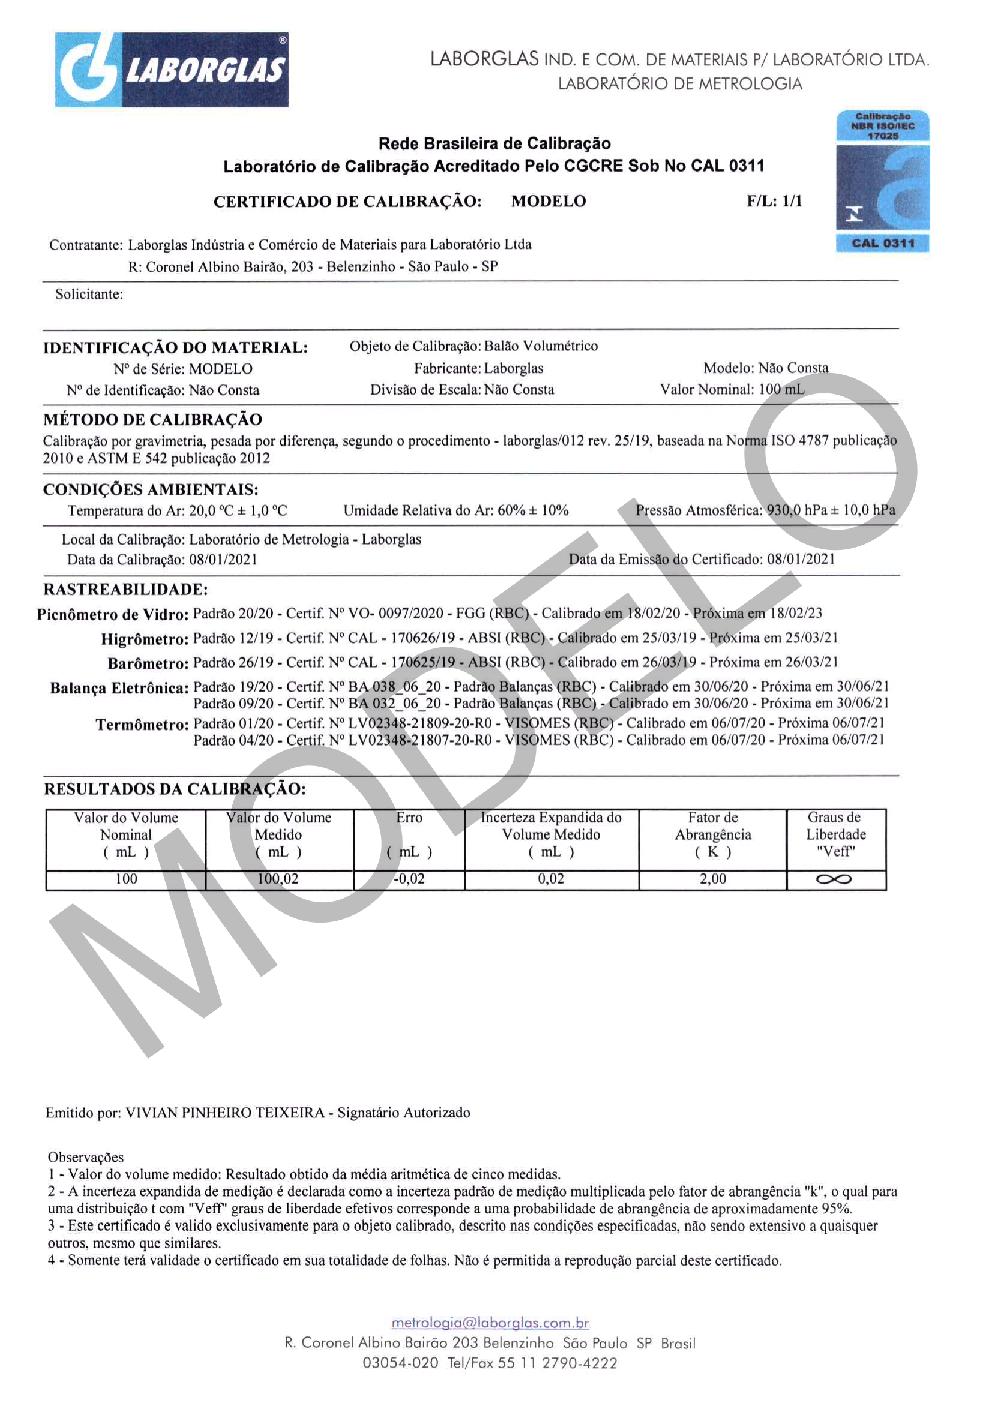 BALÃO VOLUMÉTRICO CLASSE A ROLHA POLI ÂMBAR C/ CERTIFICADO RBC 100 ML - Marca Laborglas - Cód. 91678246-R